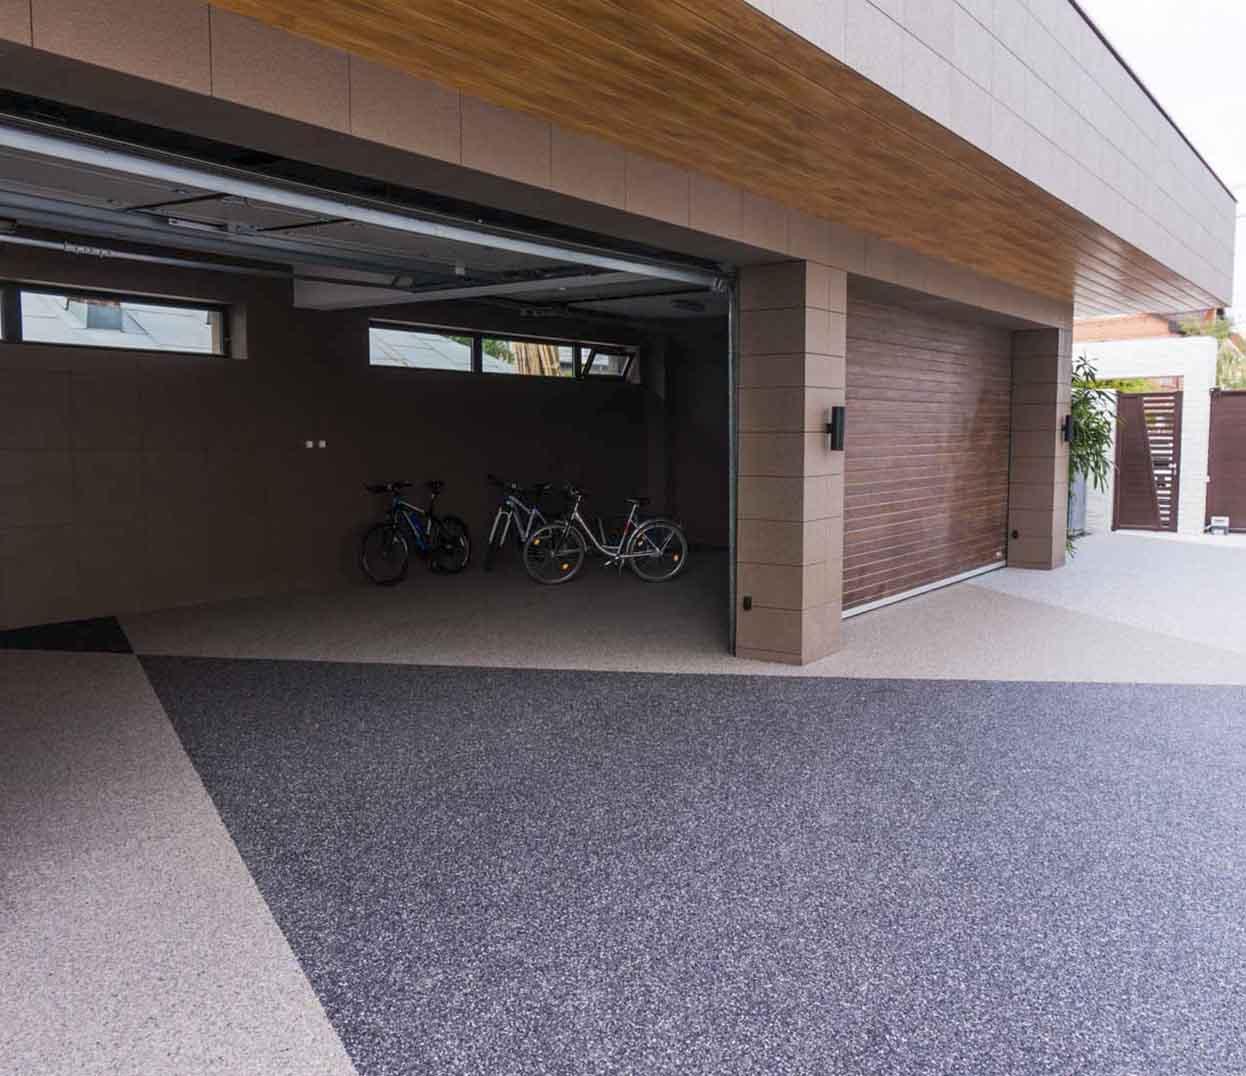 viarustik-stone-carpet 9